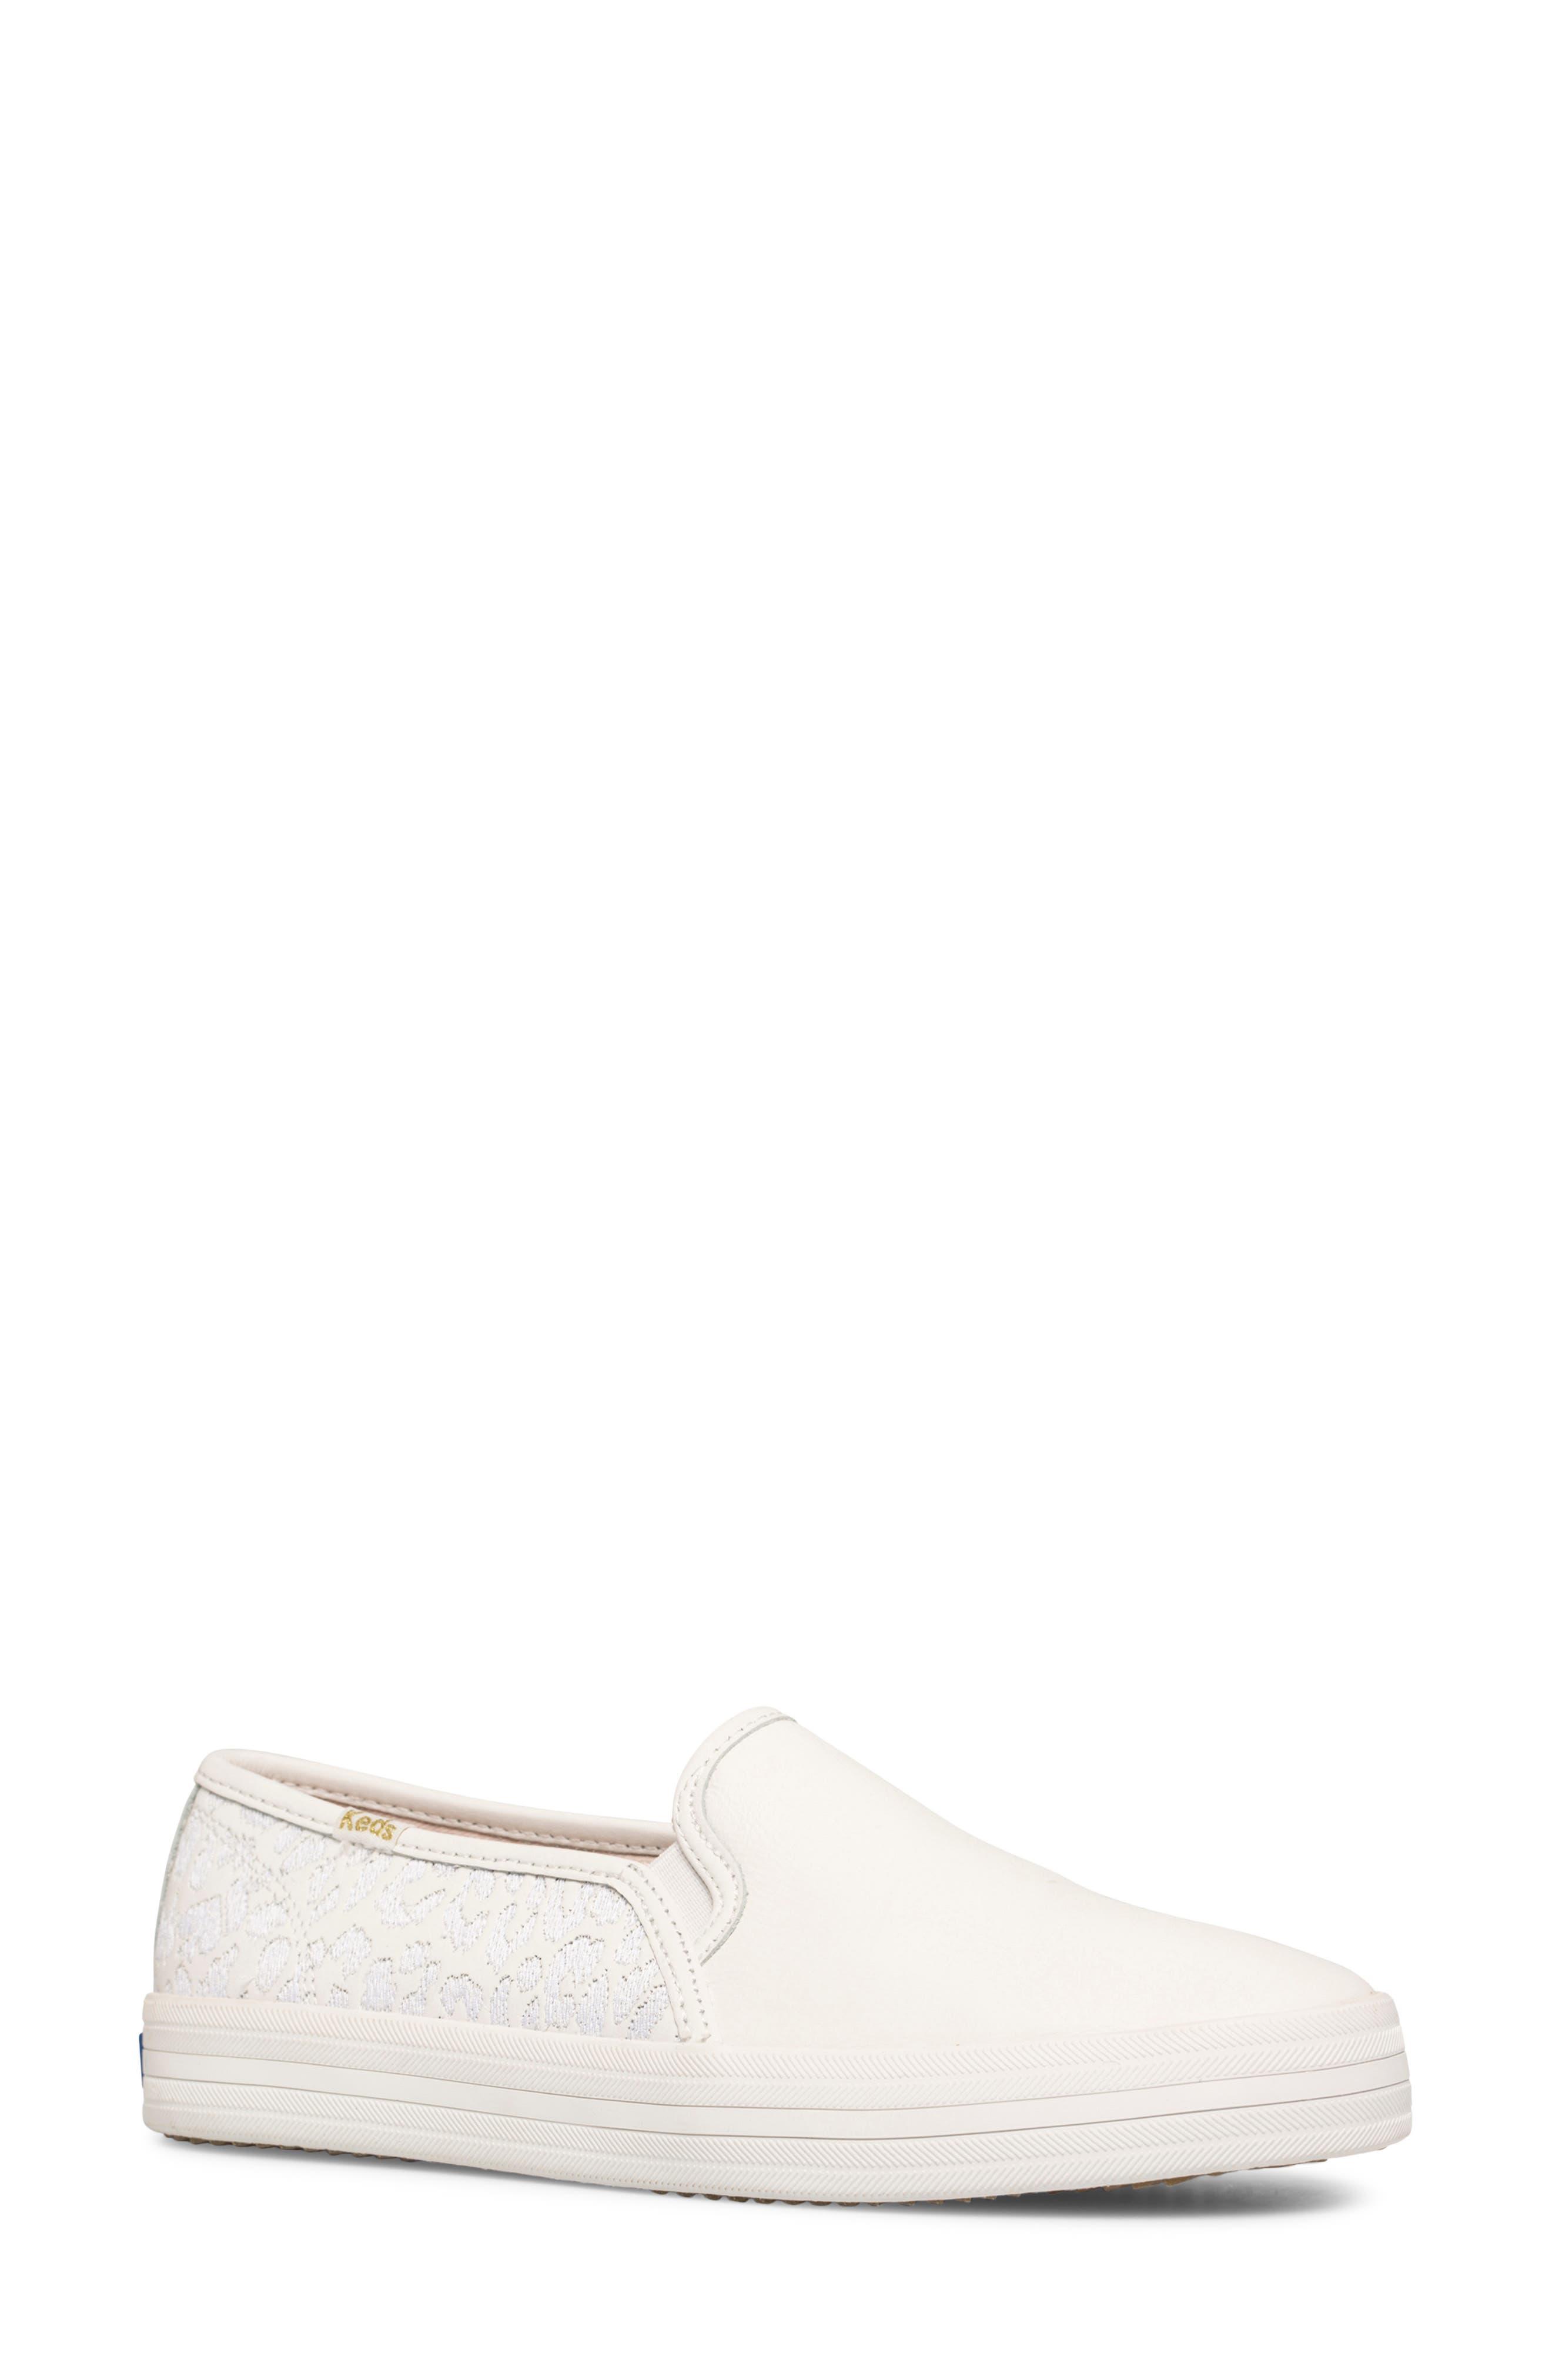 Women's Keds X Kate Spade New York Double Decker Embroidered Slip-On Sneaker